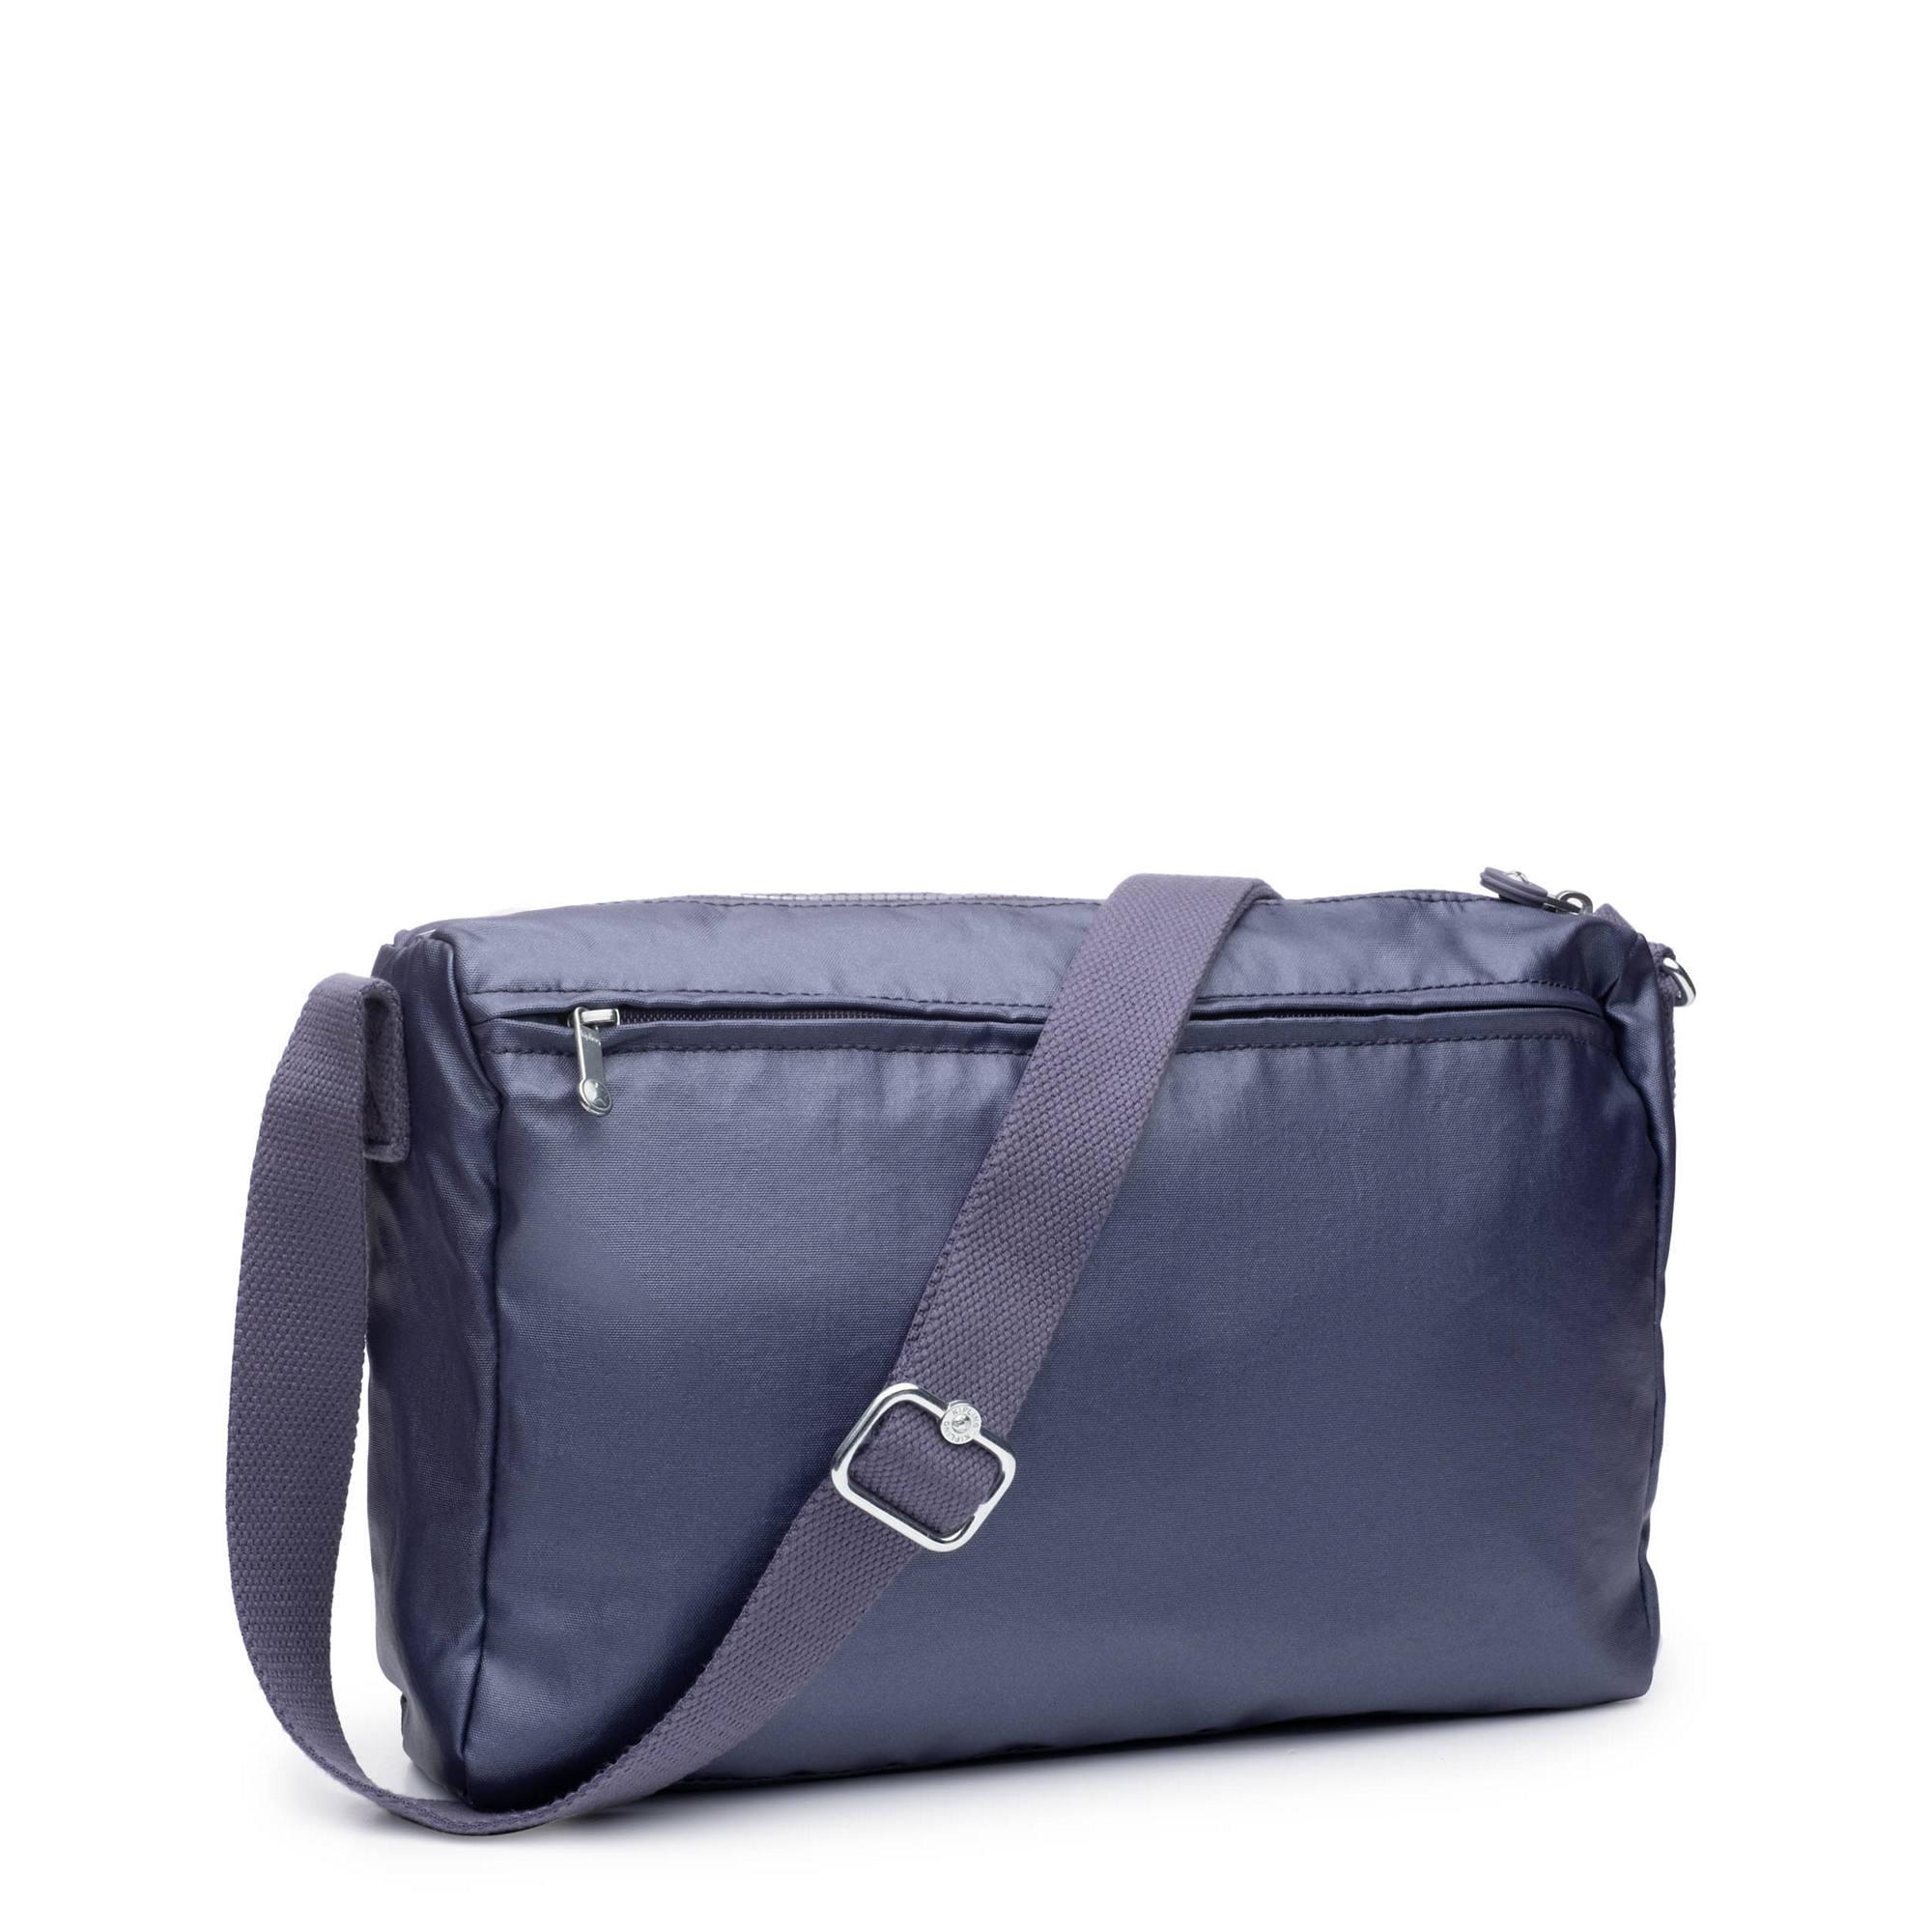 Jean Crossbody Bag,Enchanted Purple Metallic,large-zoomed